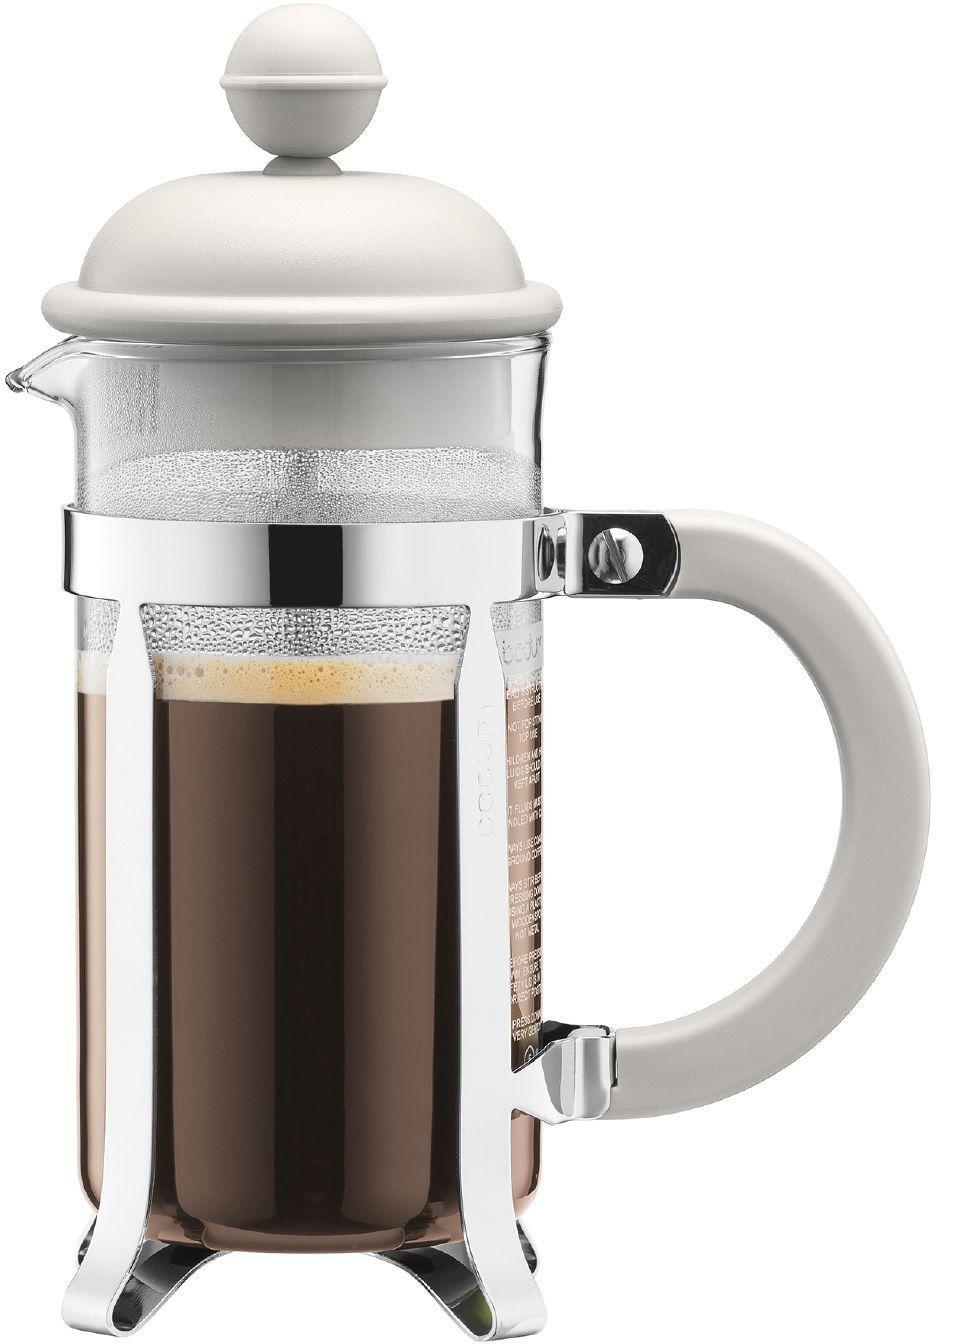 bodum caffettiera coffee maker 3 cup review. Black Bedroom Furniture Sets. Home Design Ideas